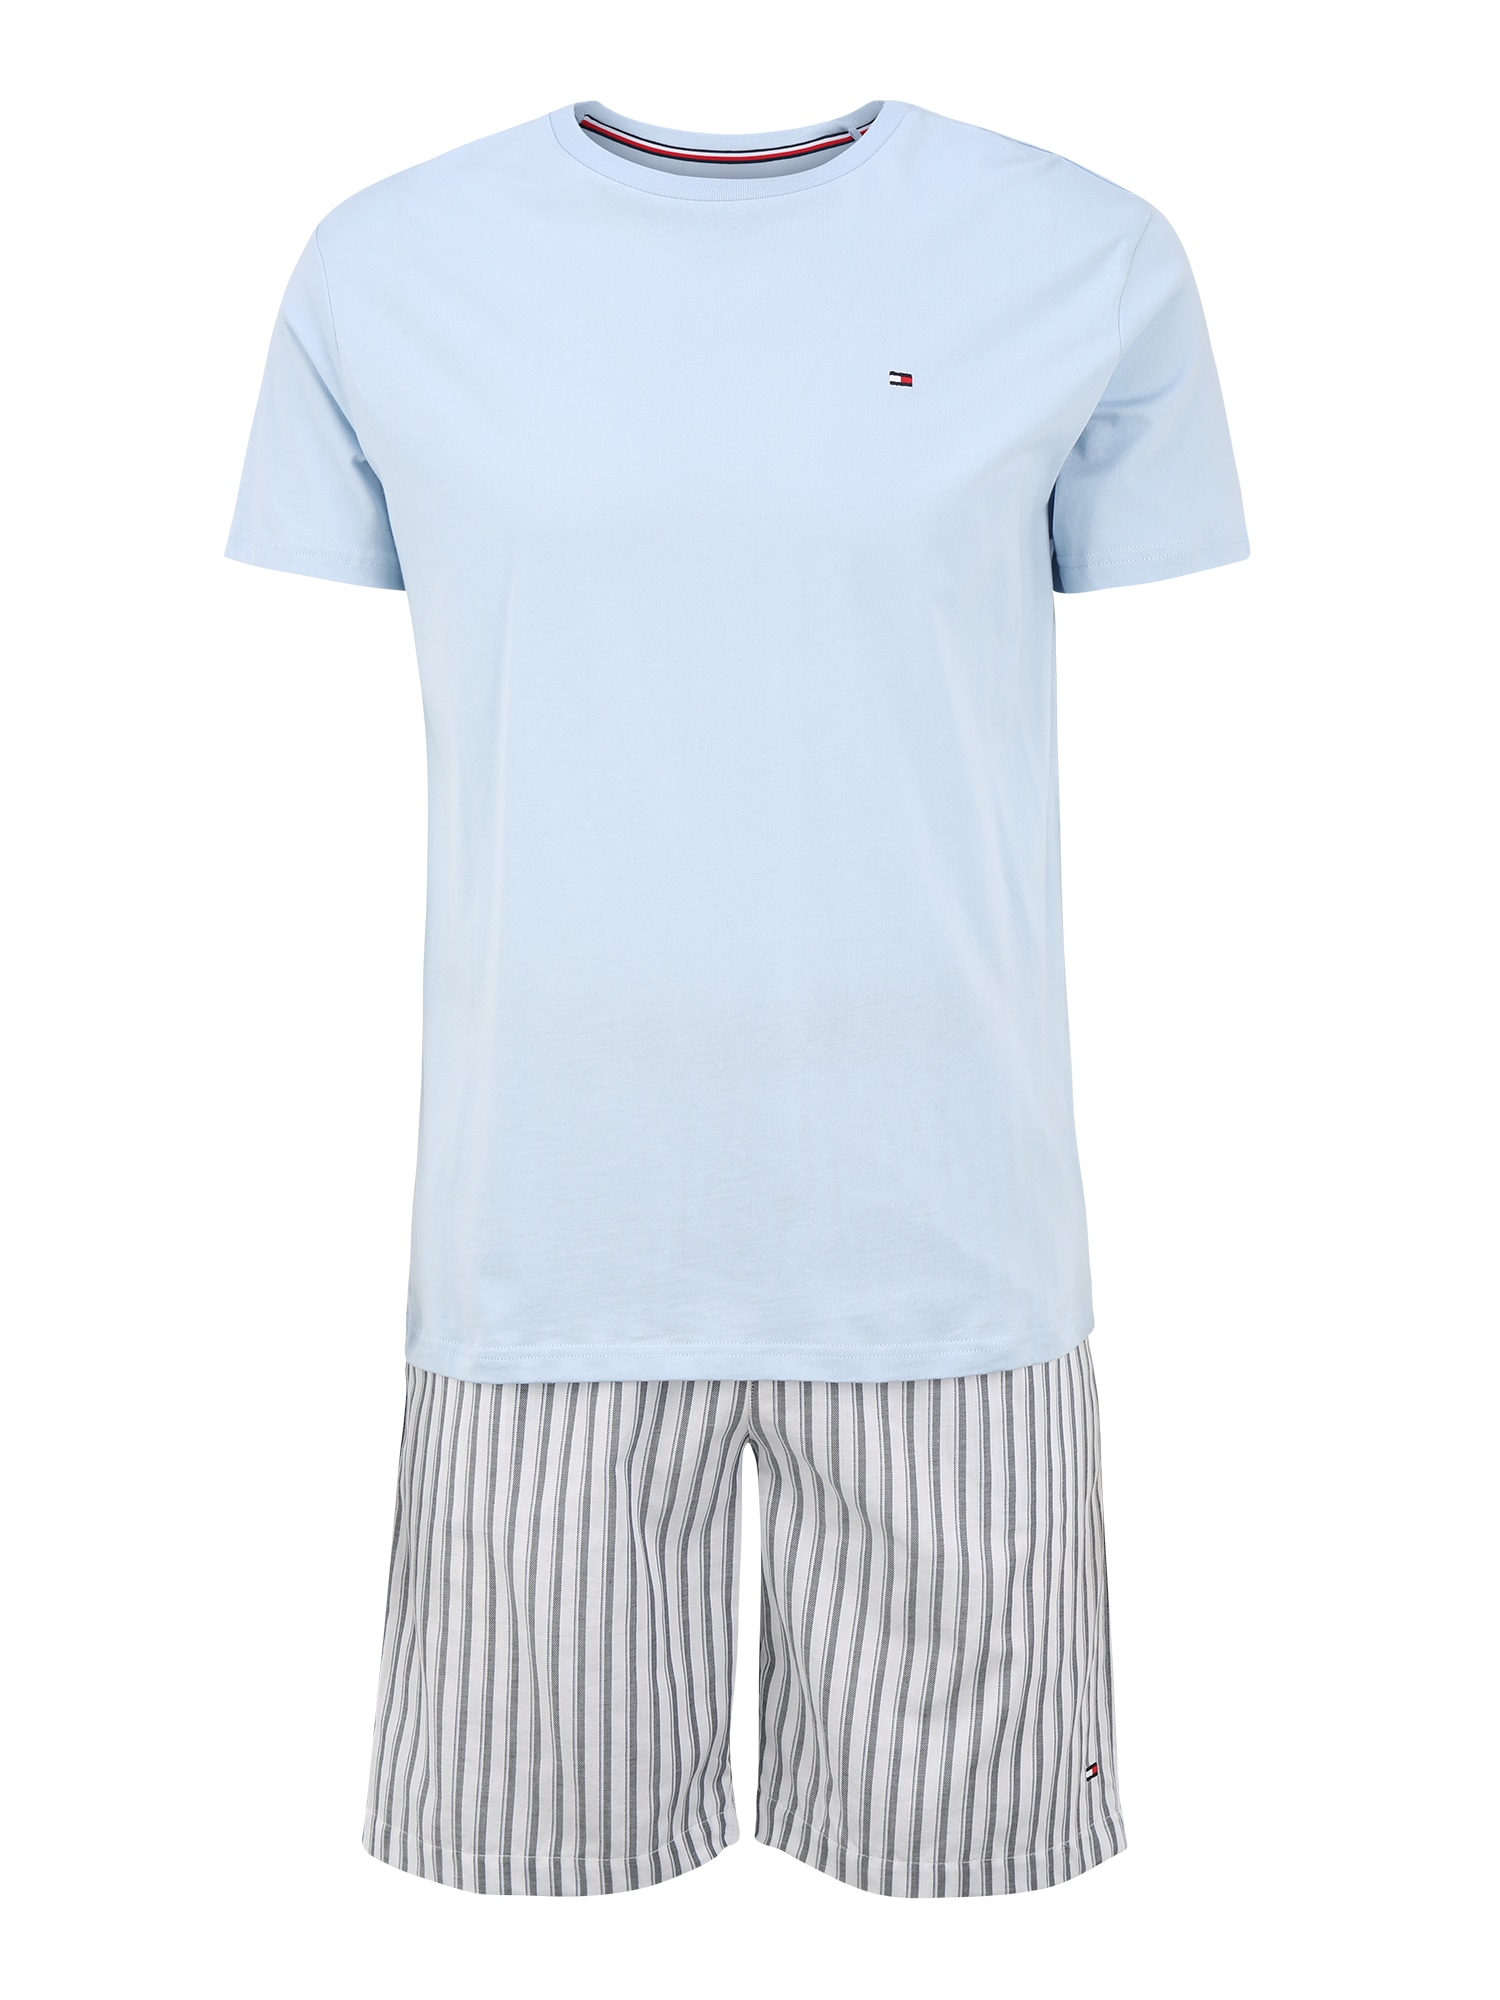 Tommy Hilfiger Underwear Trumpa pižama šviesiai pilka / mėlyna